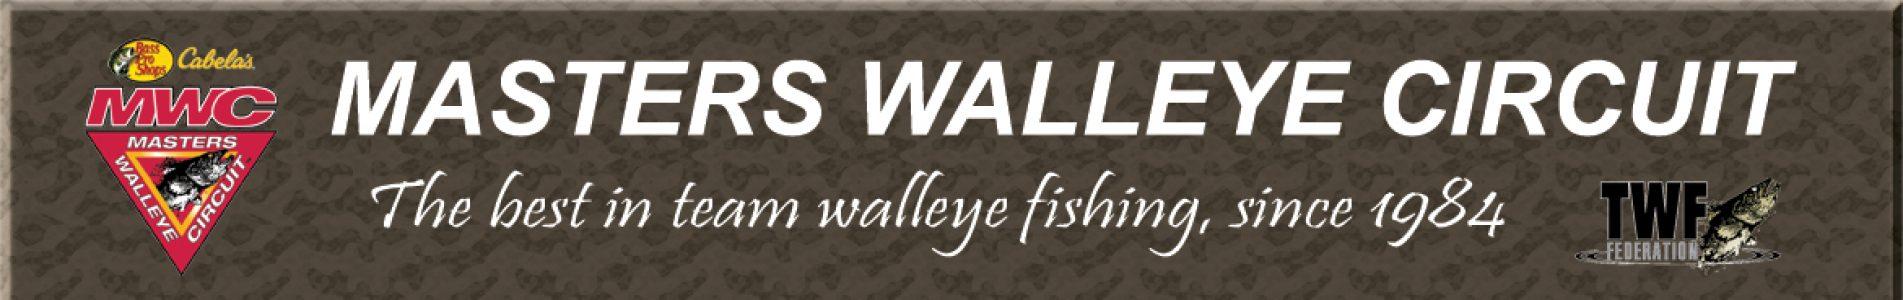 Masters Walleye Circuit